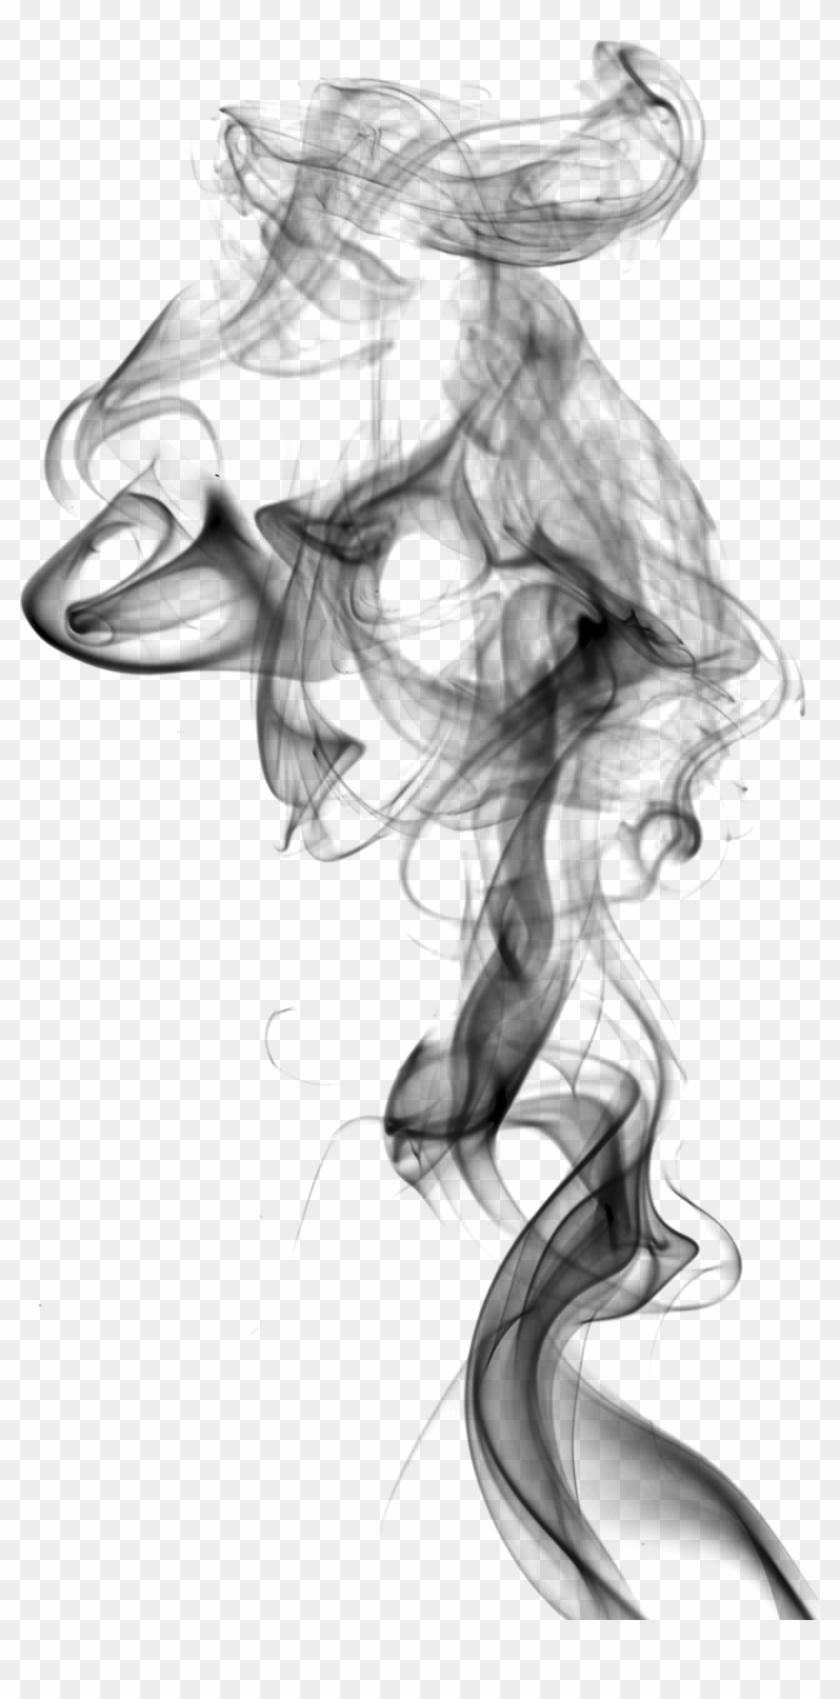 Smoke clipart black and white clip royalty free library Drawing Smoking White Smoke - Smoke Clipart Black And White, HD Png ... clip royalty free library